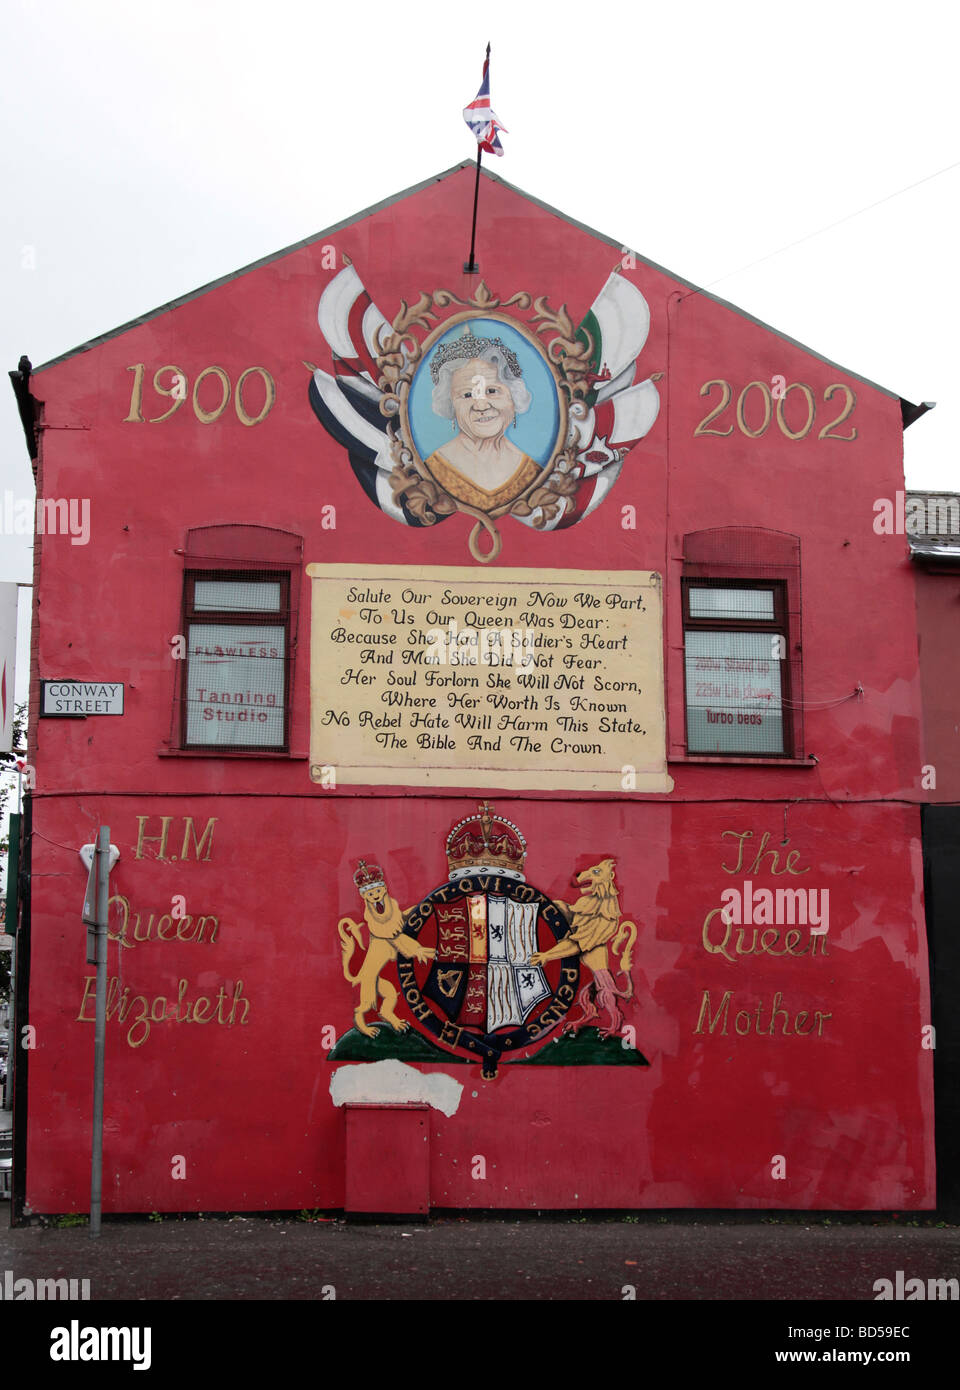 Mural to commemorate Queen Elizabeth the Queen Mother in the loyalist Shankill area of West Belfast. - Stock Image